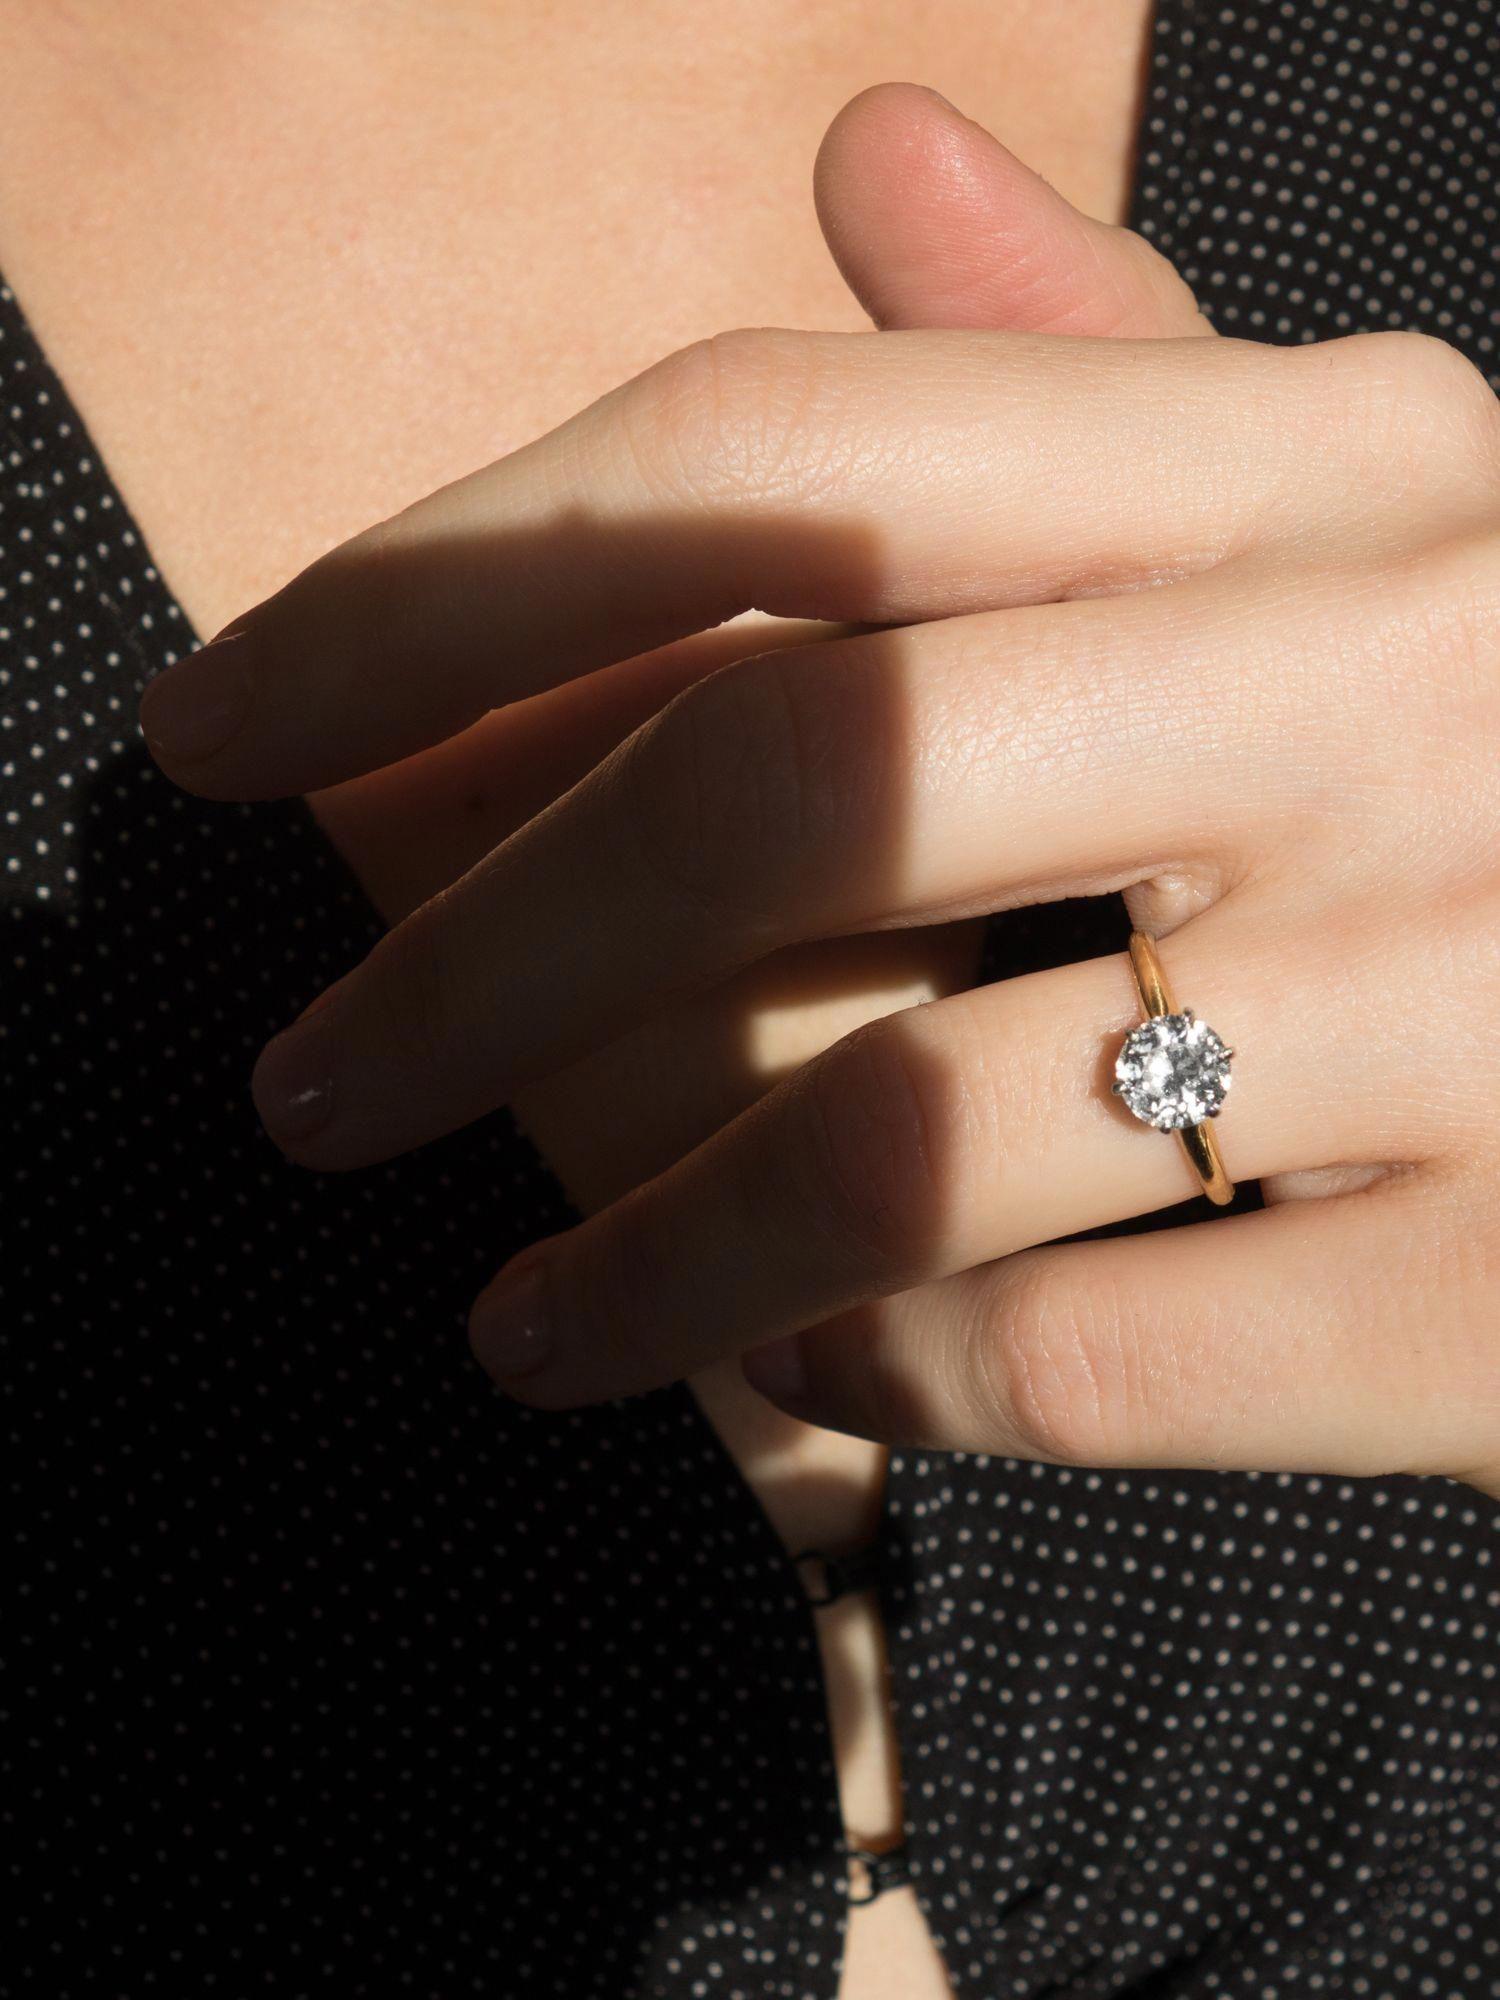 95 Carat Vintage Tiffany Co Engagement Ring Solitaireweddingring Tiffany Engagement Ring Tiffany Wedding Rings Wedding Rings Vintage